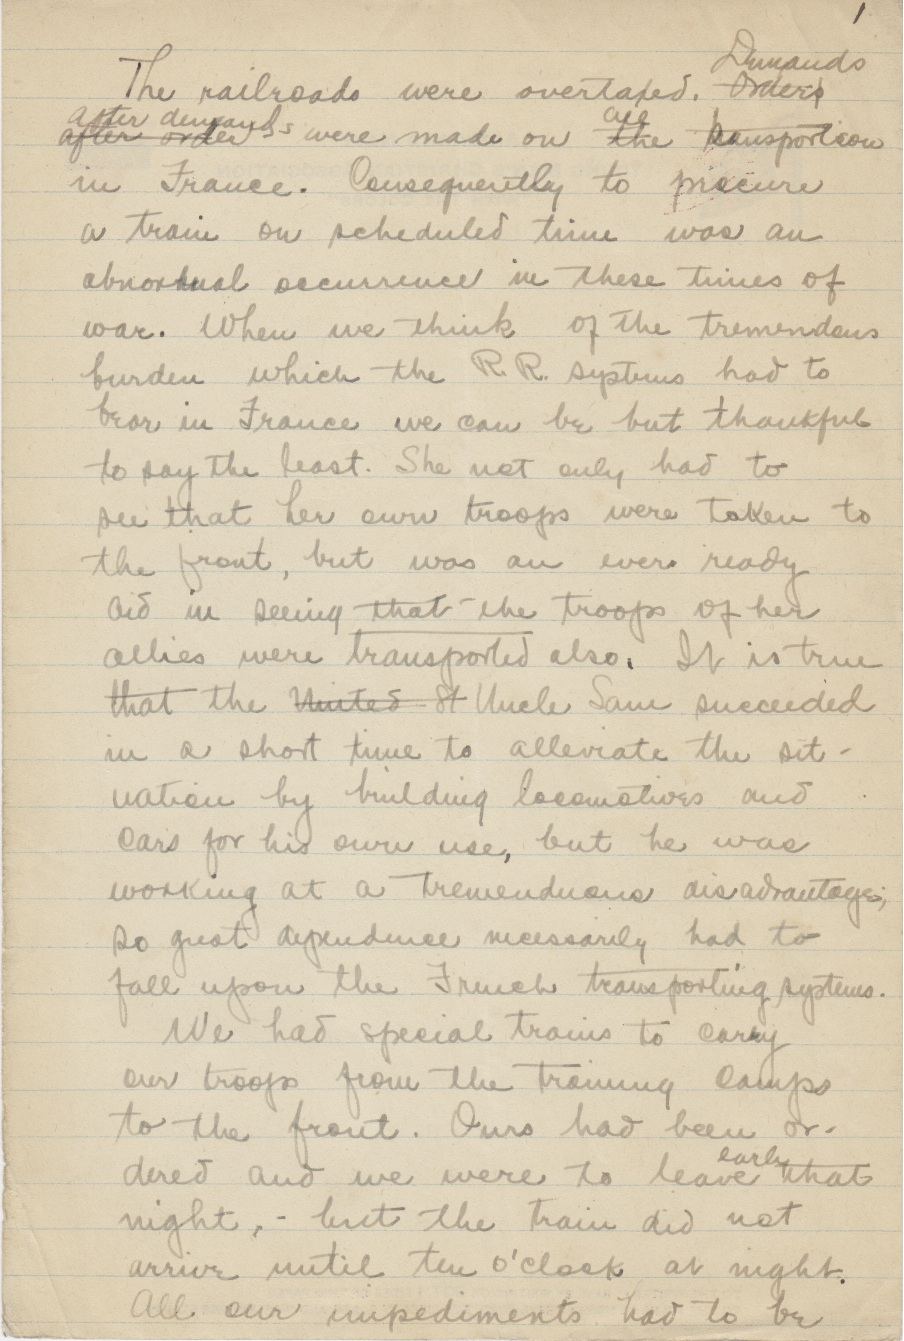 CMC 1919-9 ms 1